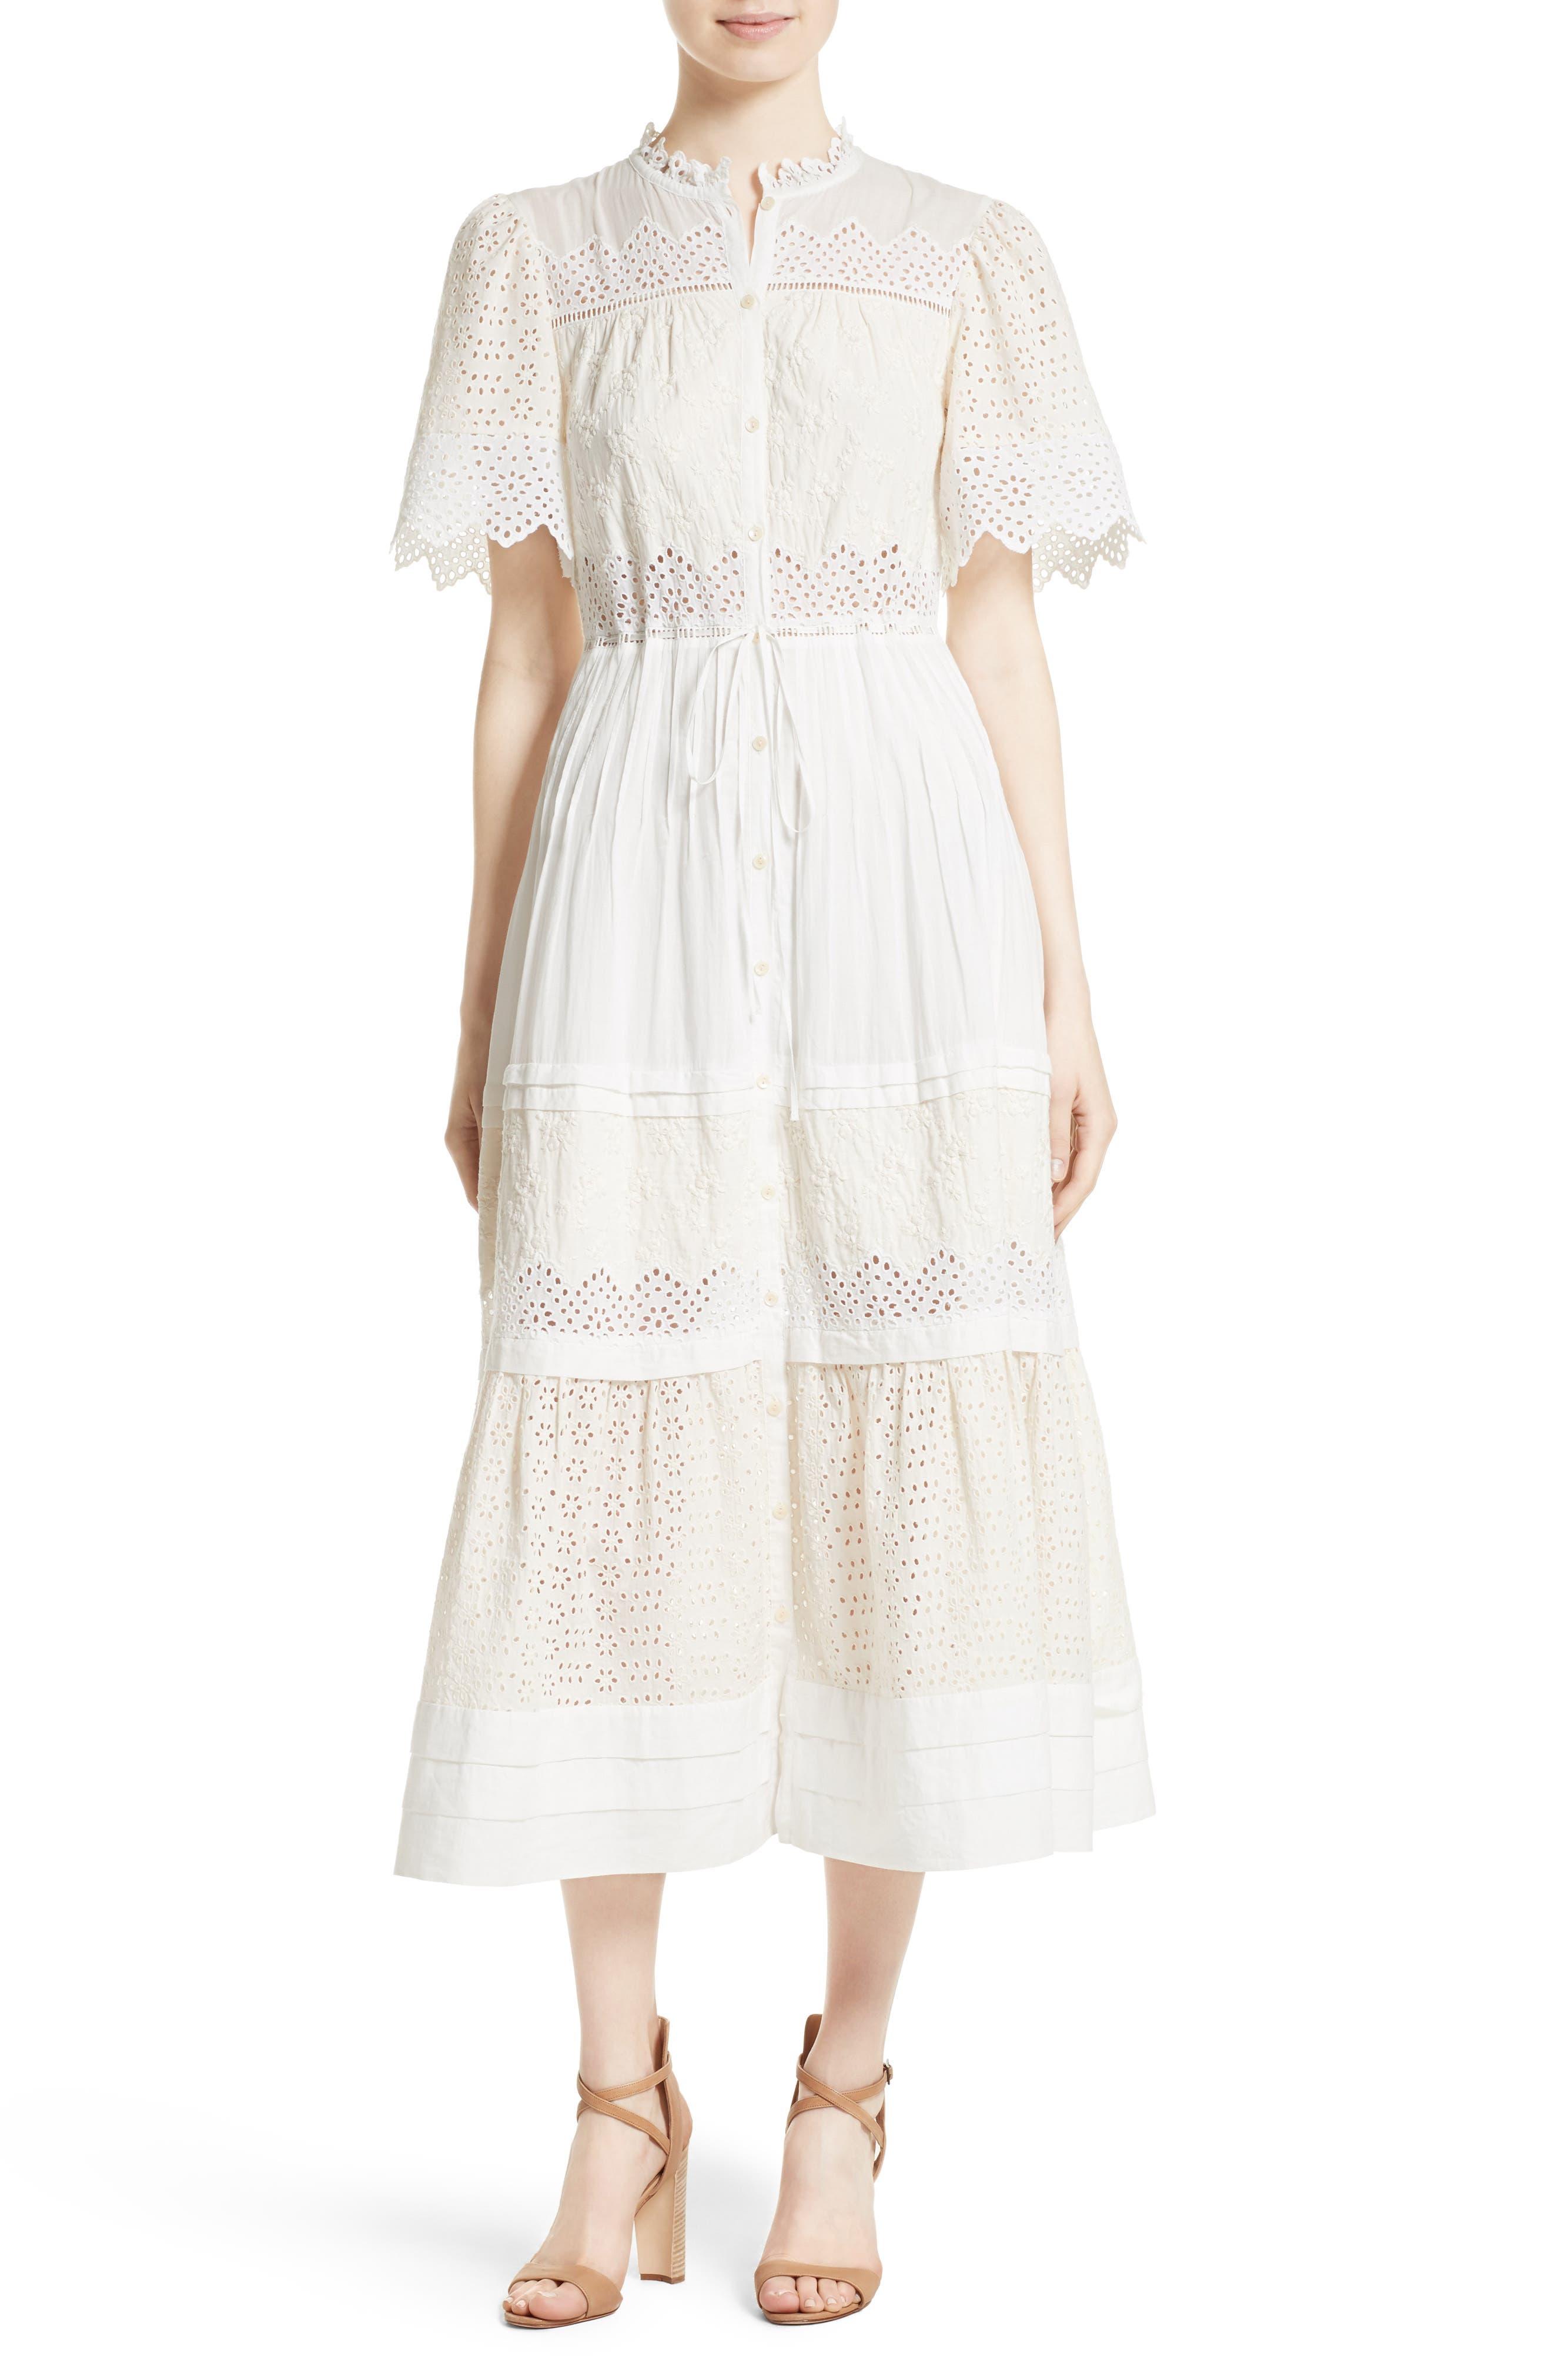 Alternate Image 1 Selected - La Vie Rebecca Taylor Embroidered Voile Midi Dress